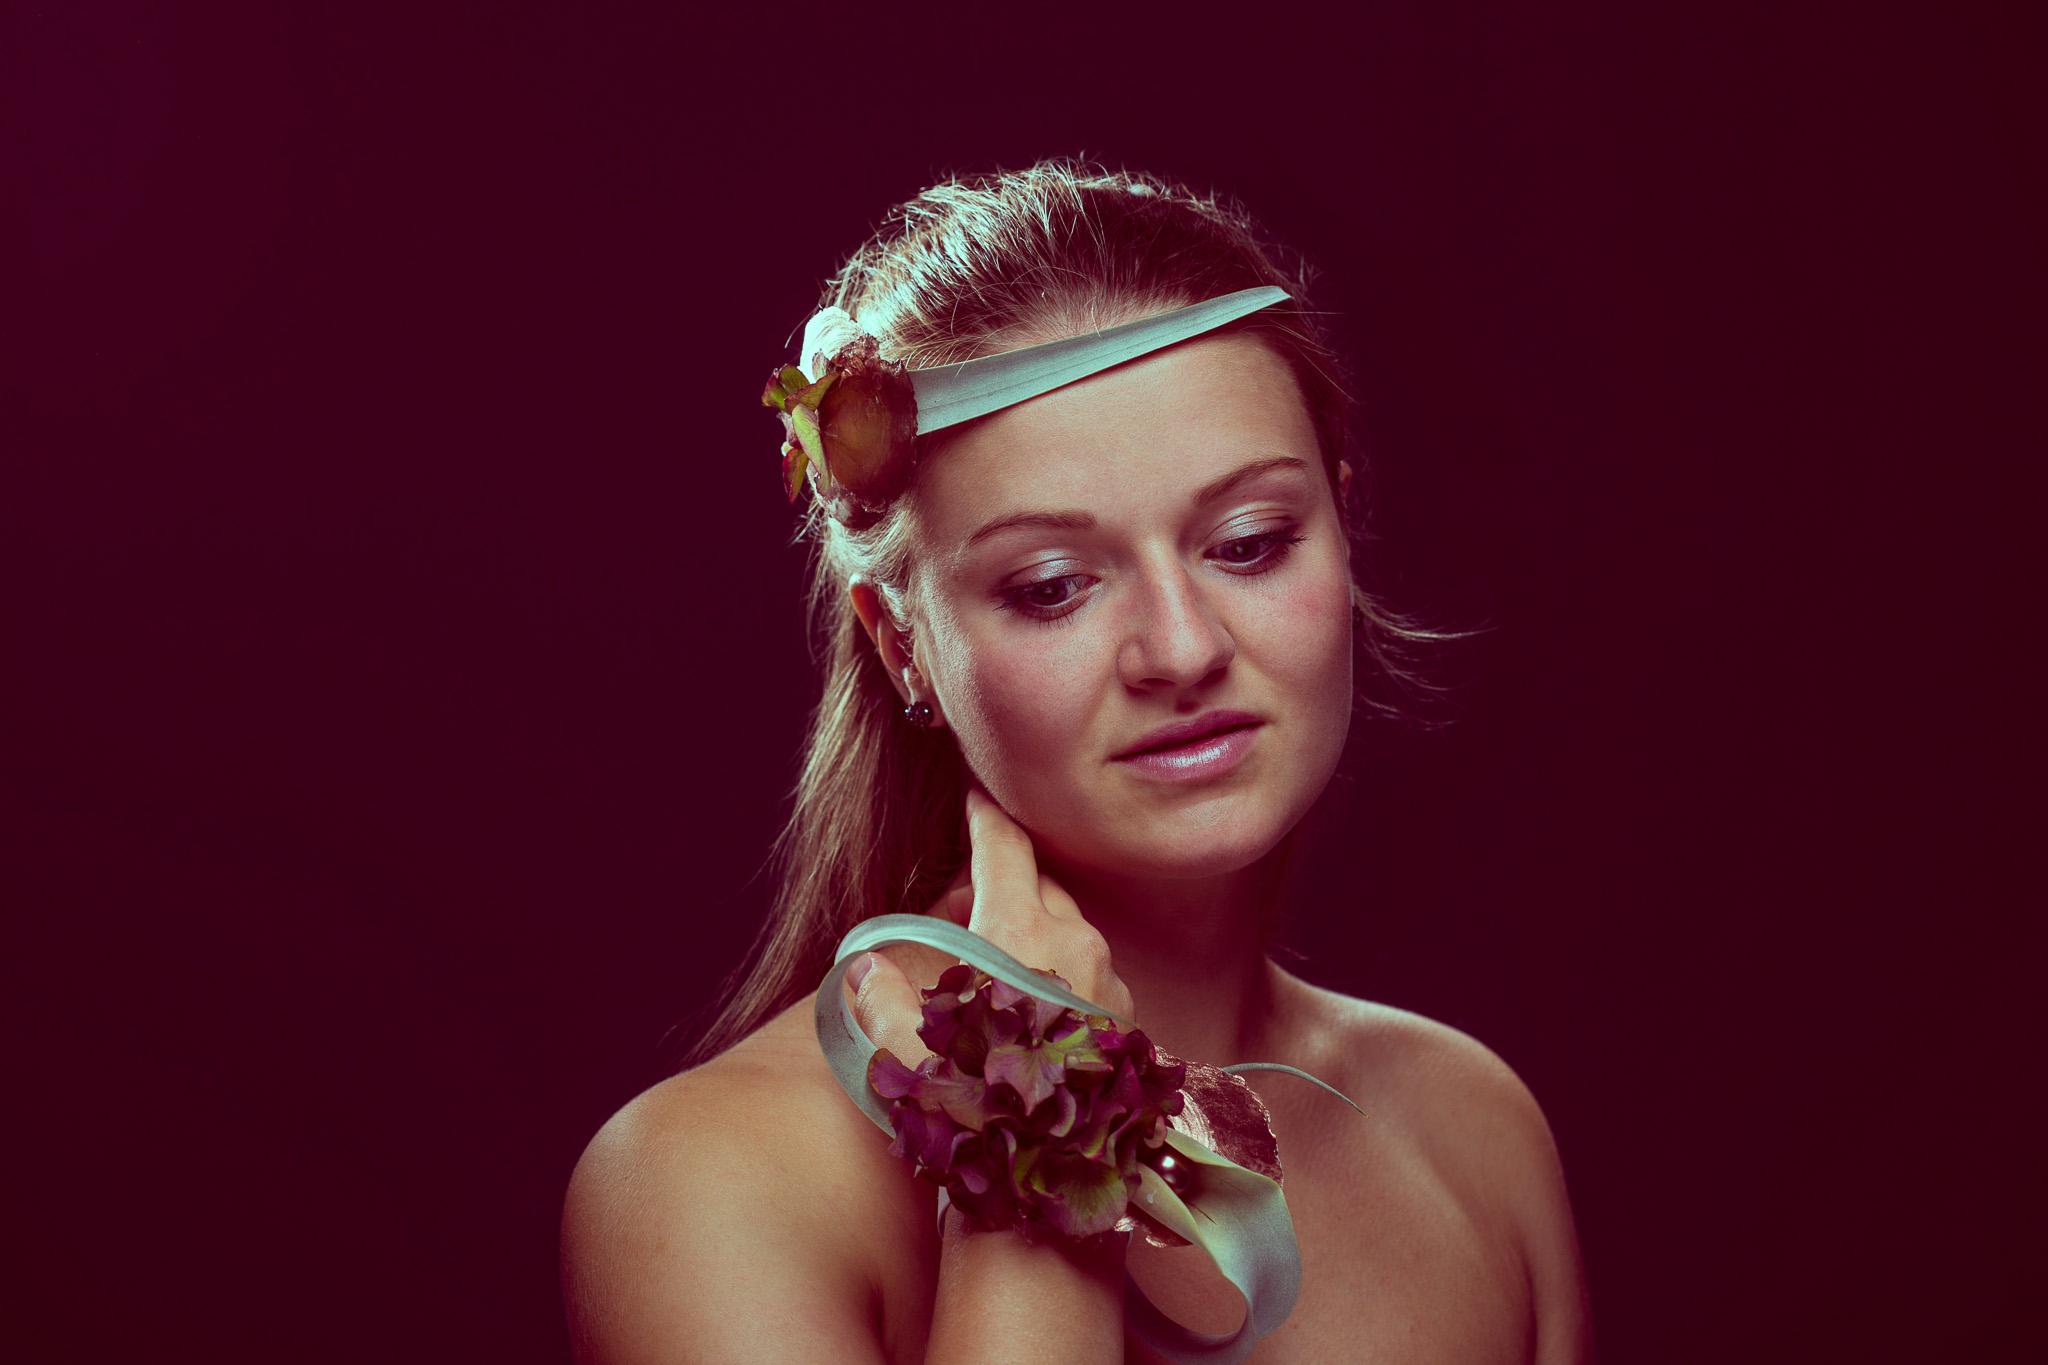 Frau mit Herbstfloristik